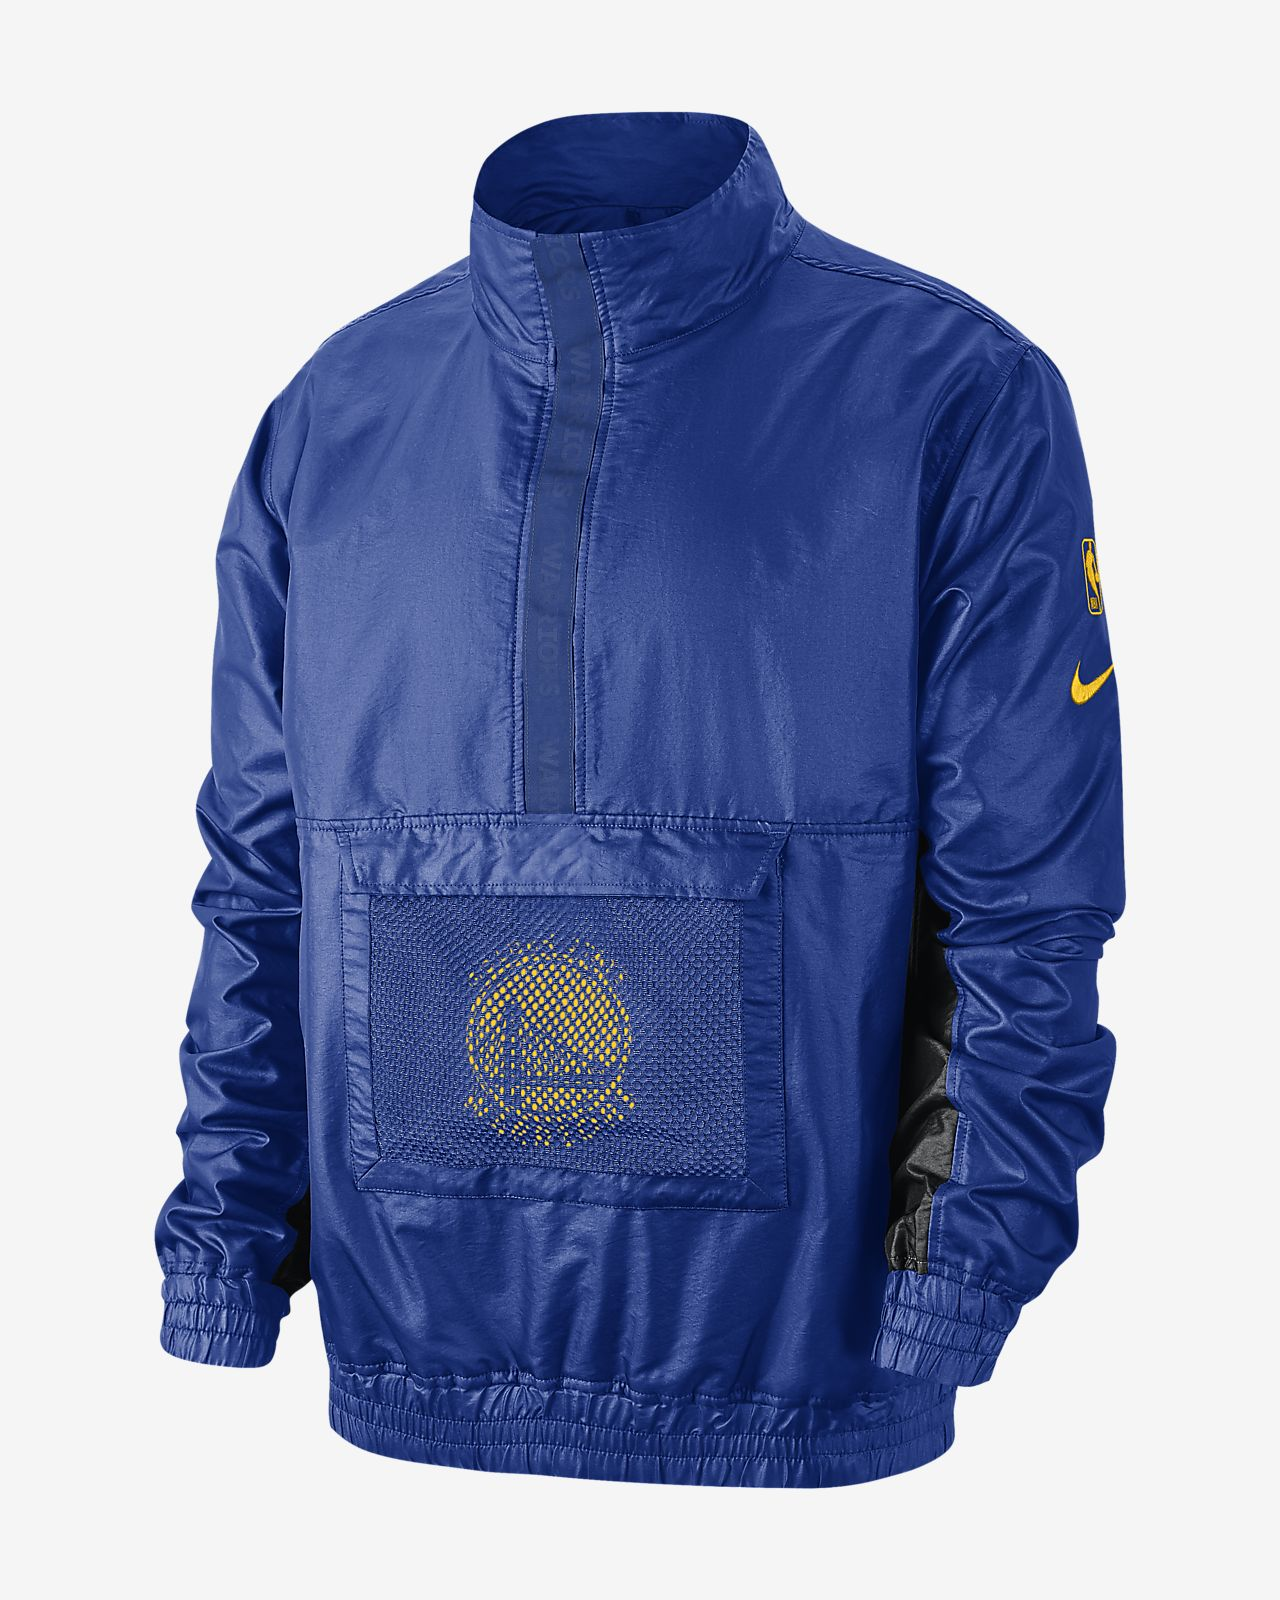 Golden State Warriors Nike könnyű férfi NBA-s kabát